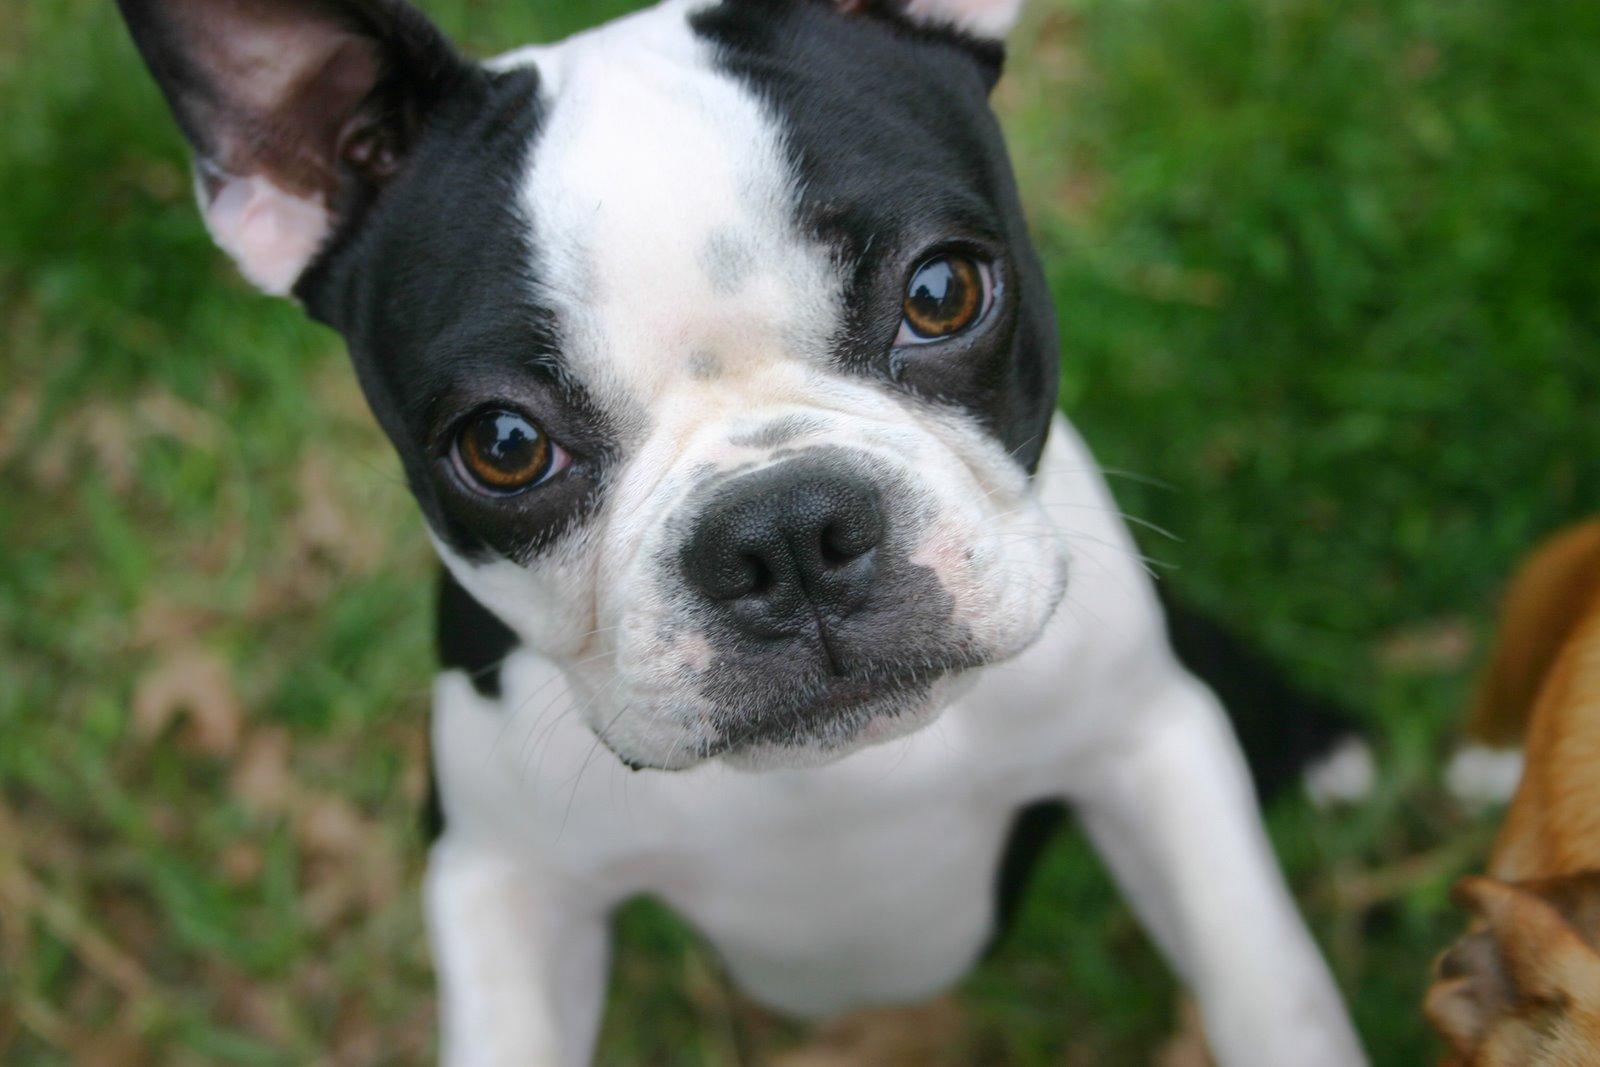 download boston terrier 21297 1600x1067 px high resolution